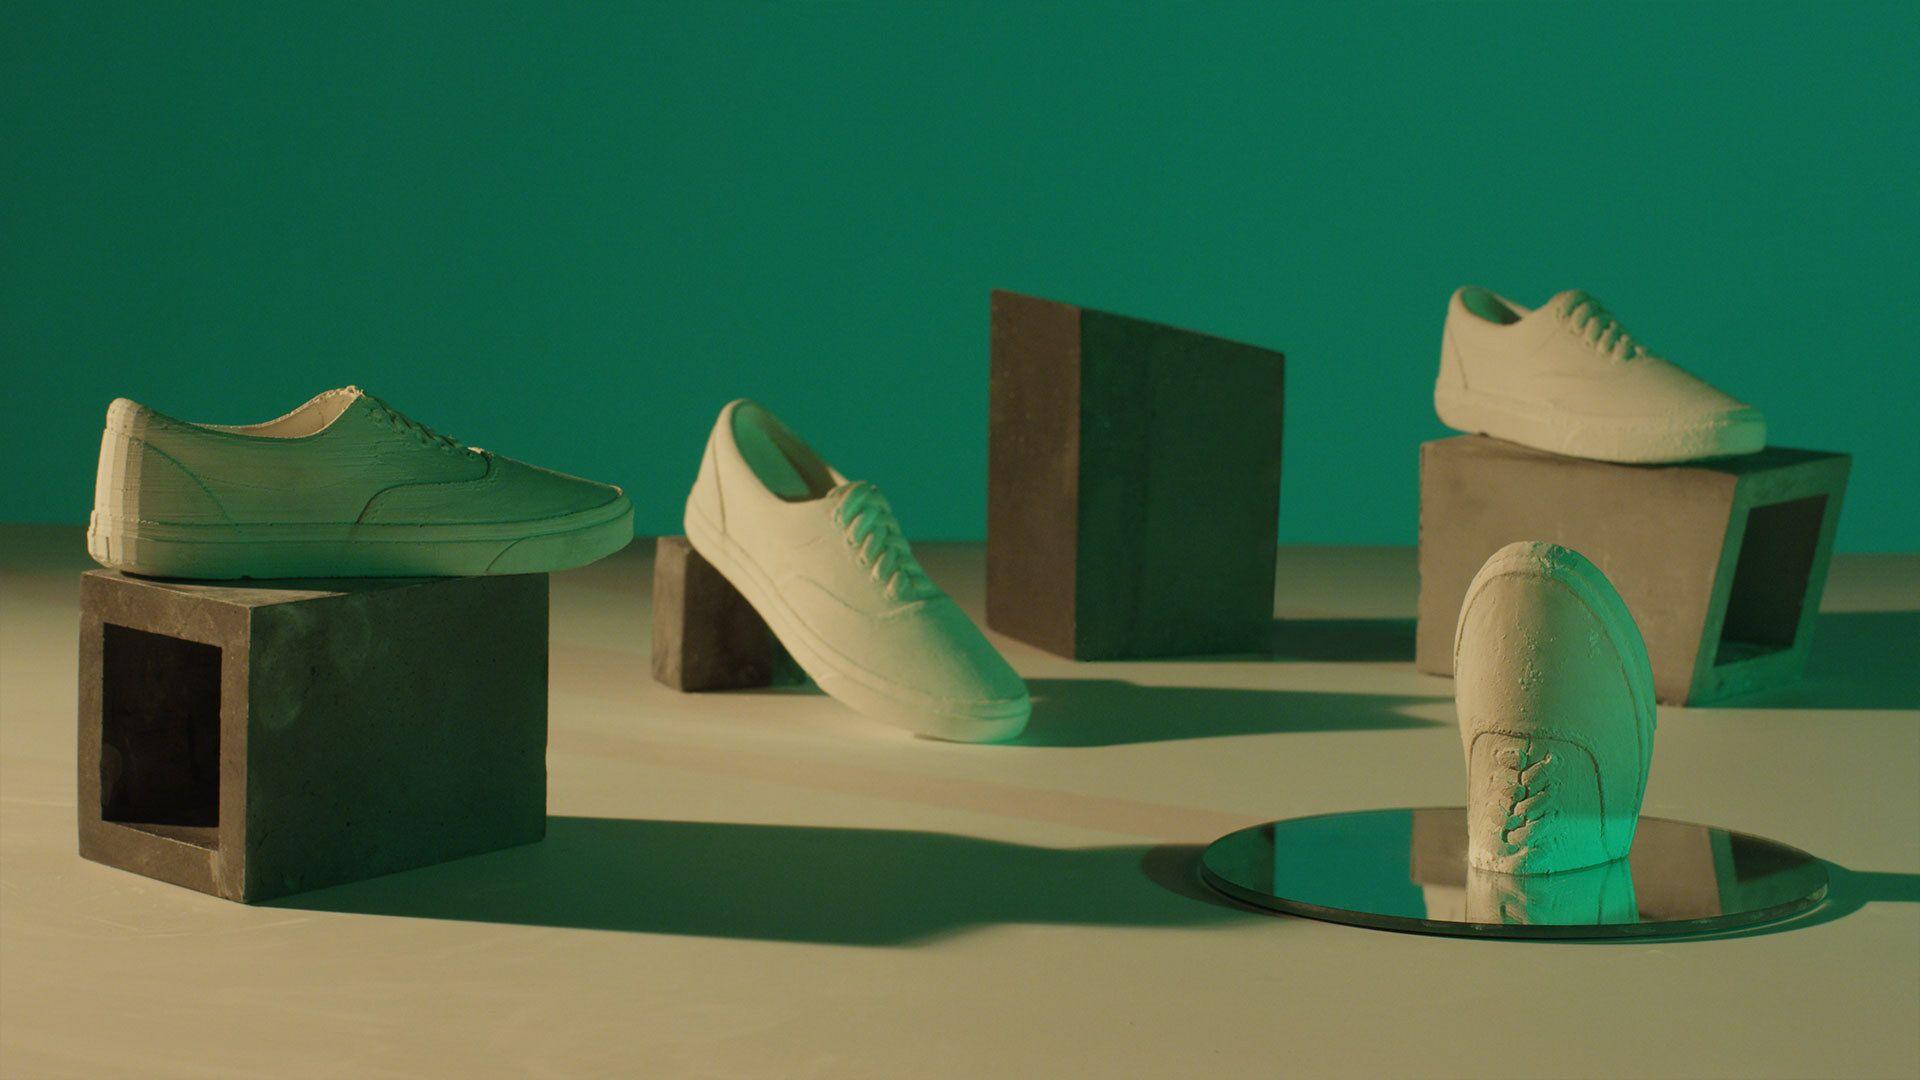 shot of Vans shoes made of sand by Simon Duhamel for OTH x VANS